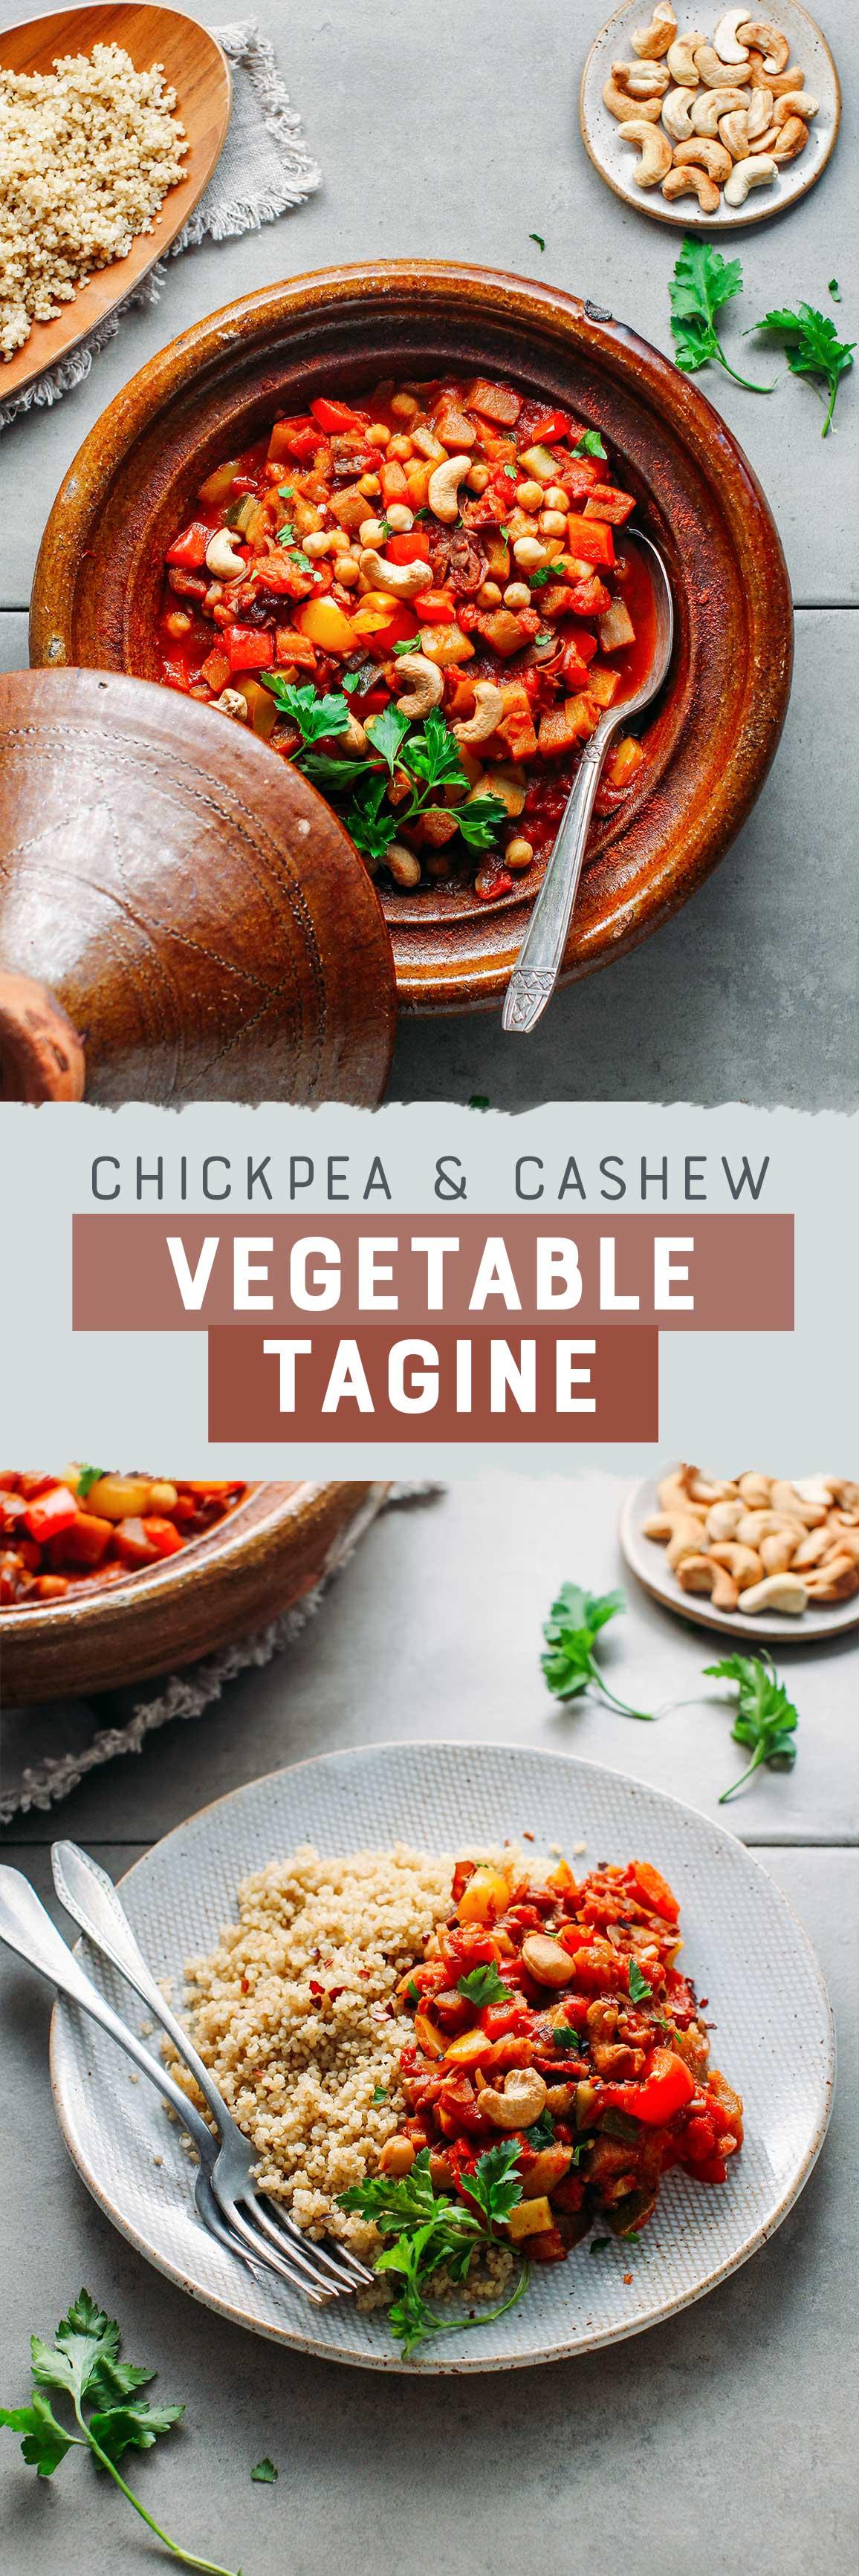 Chickpea & Cashew Vegetable Tagine